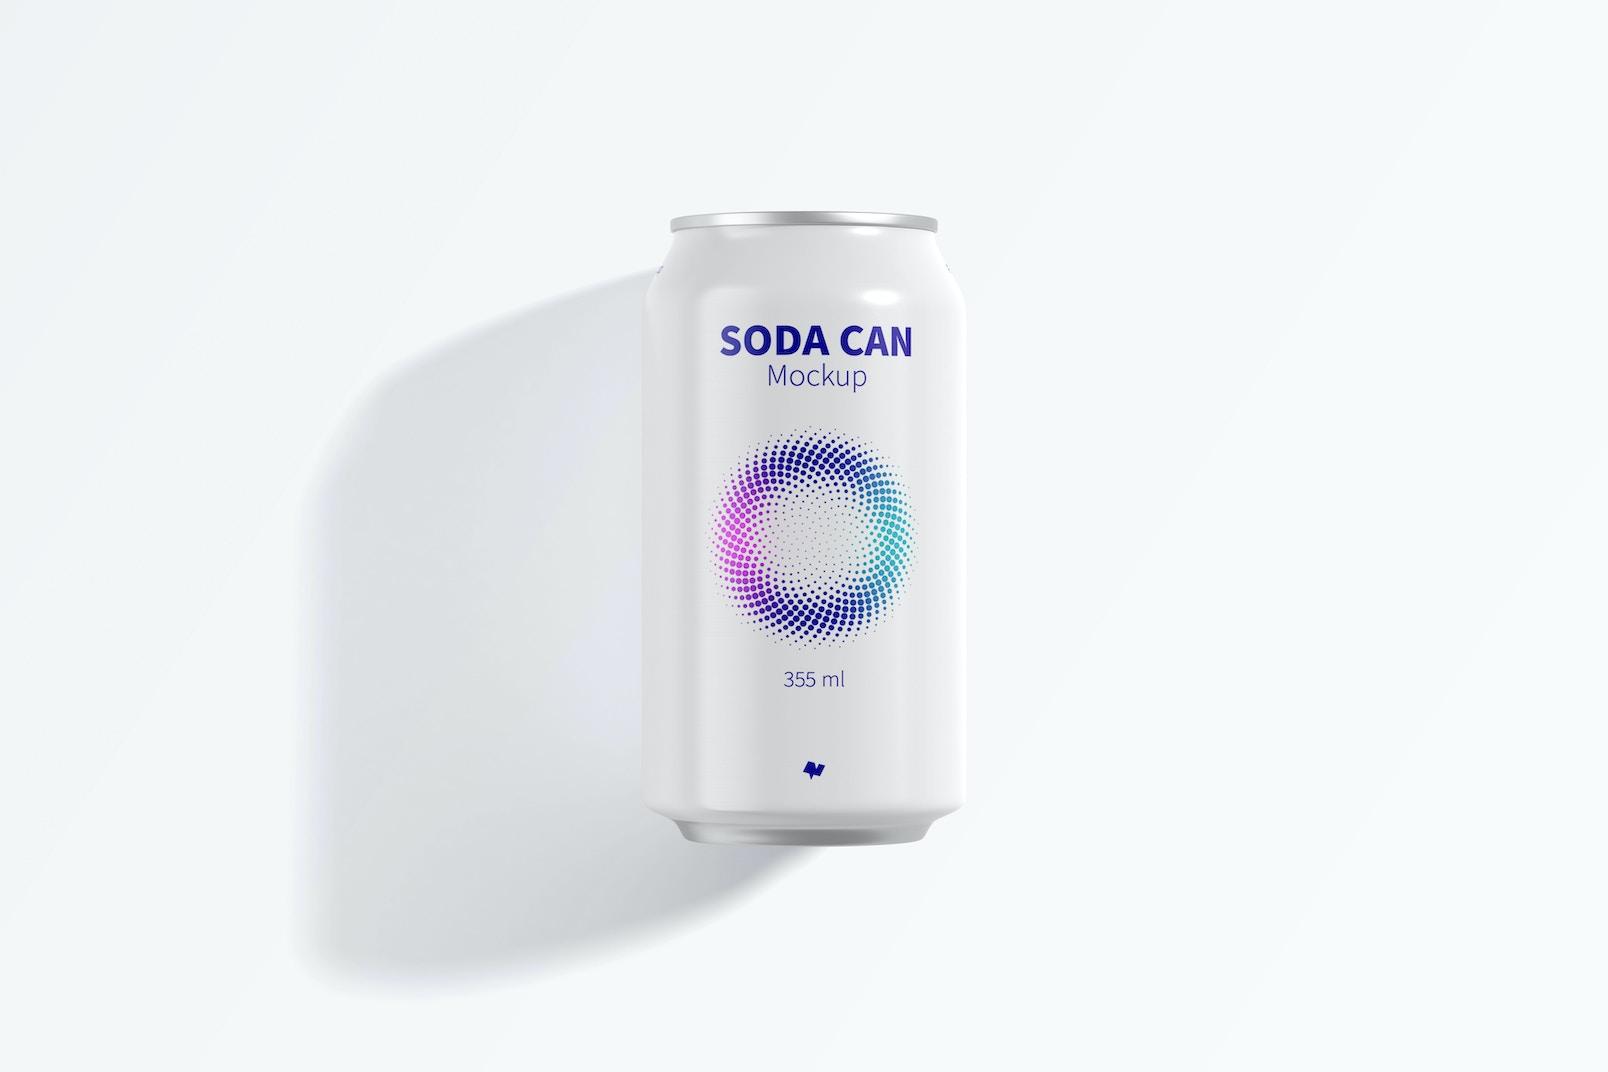 355 ml Soda Can Mockup, Top View